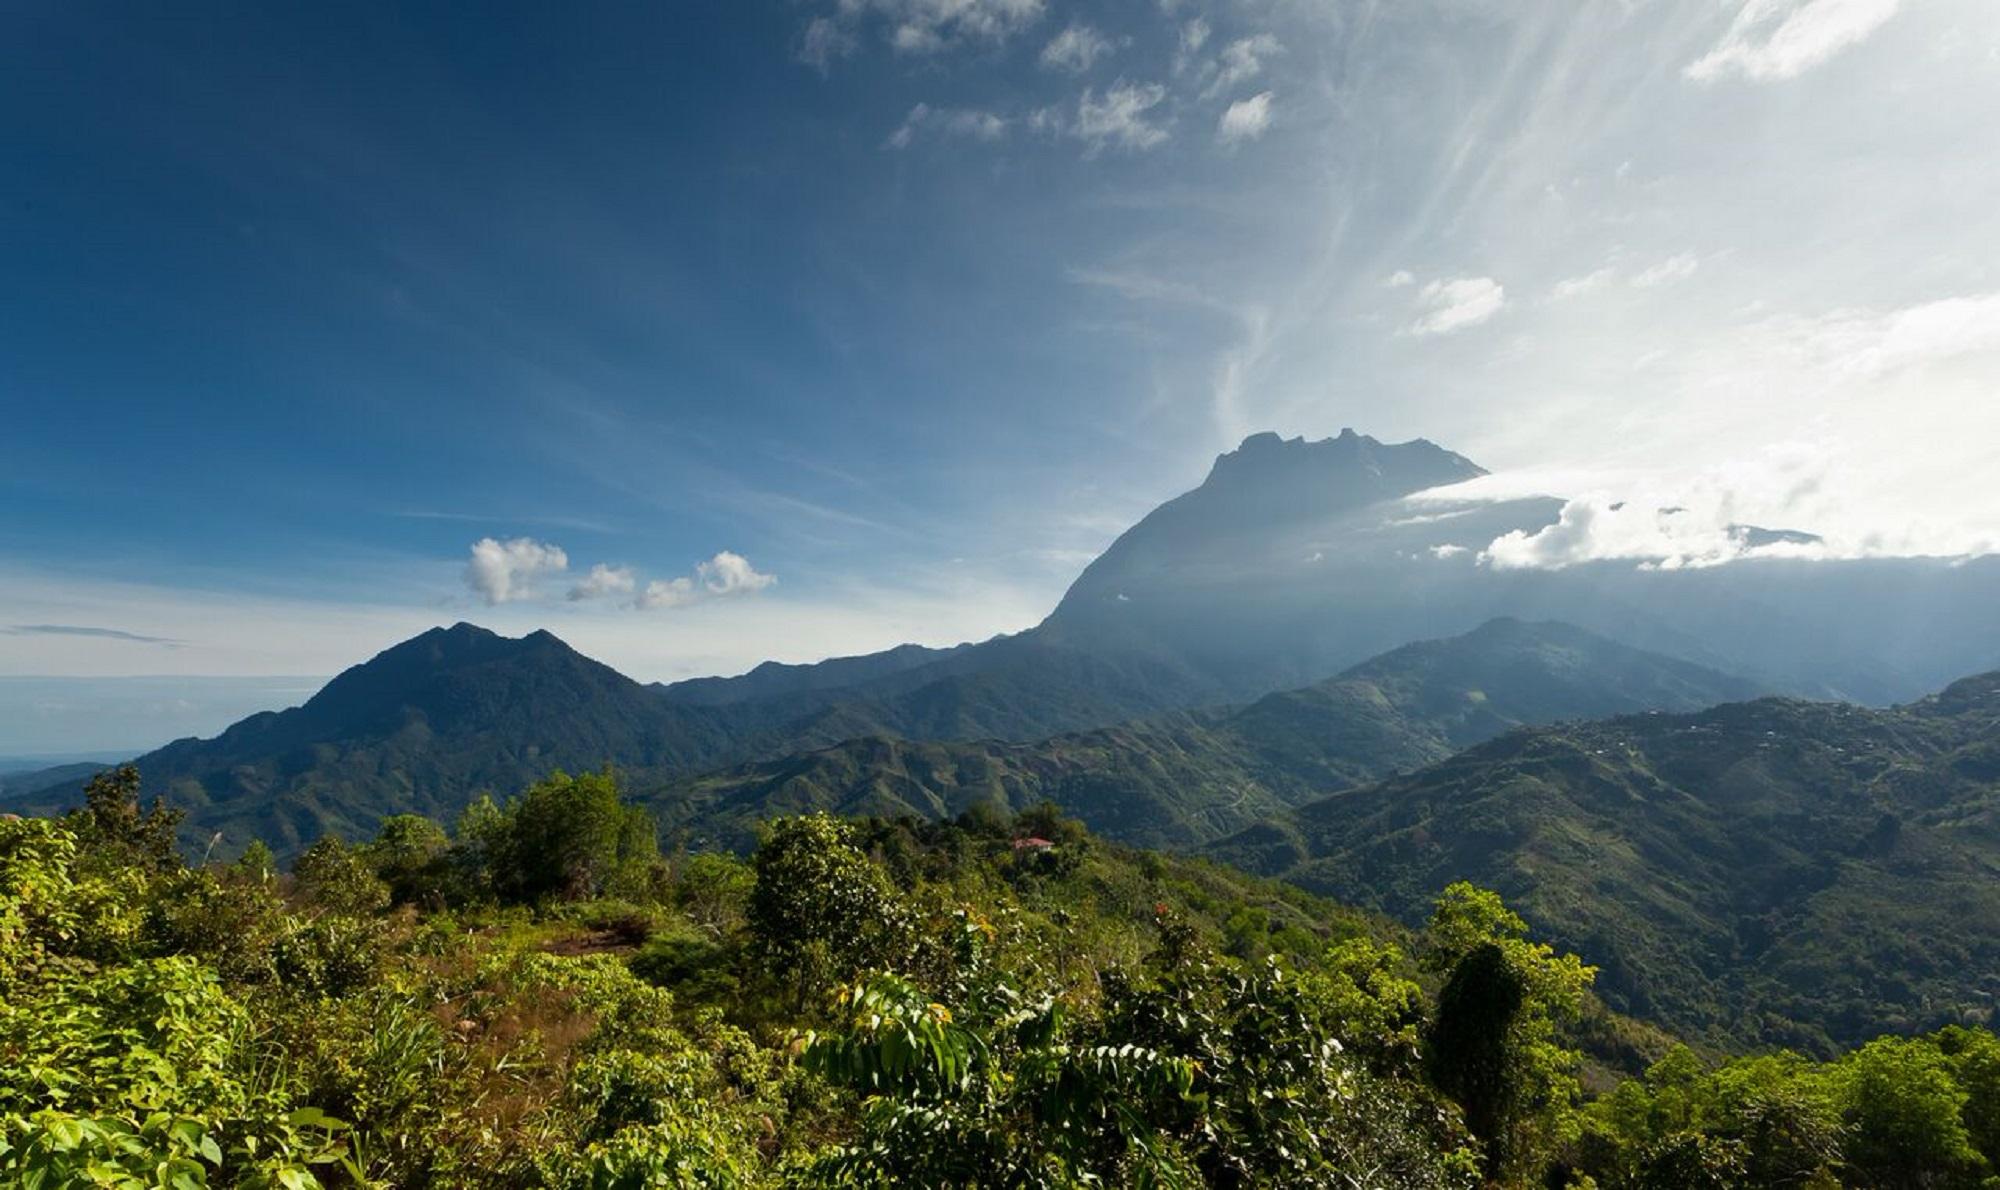 Trek Mount Kinabalu In Borneo With 360 Expeditions